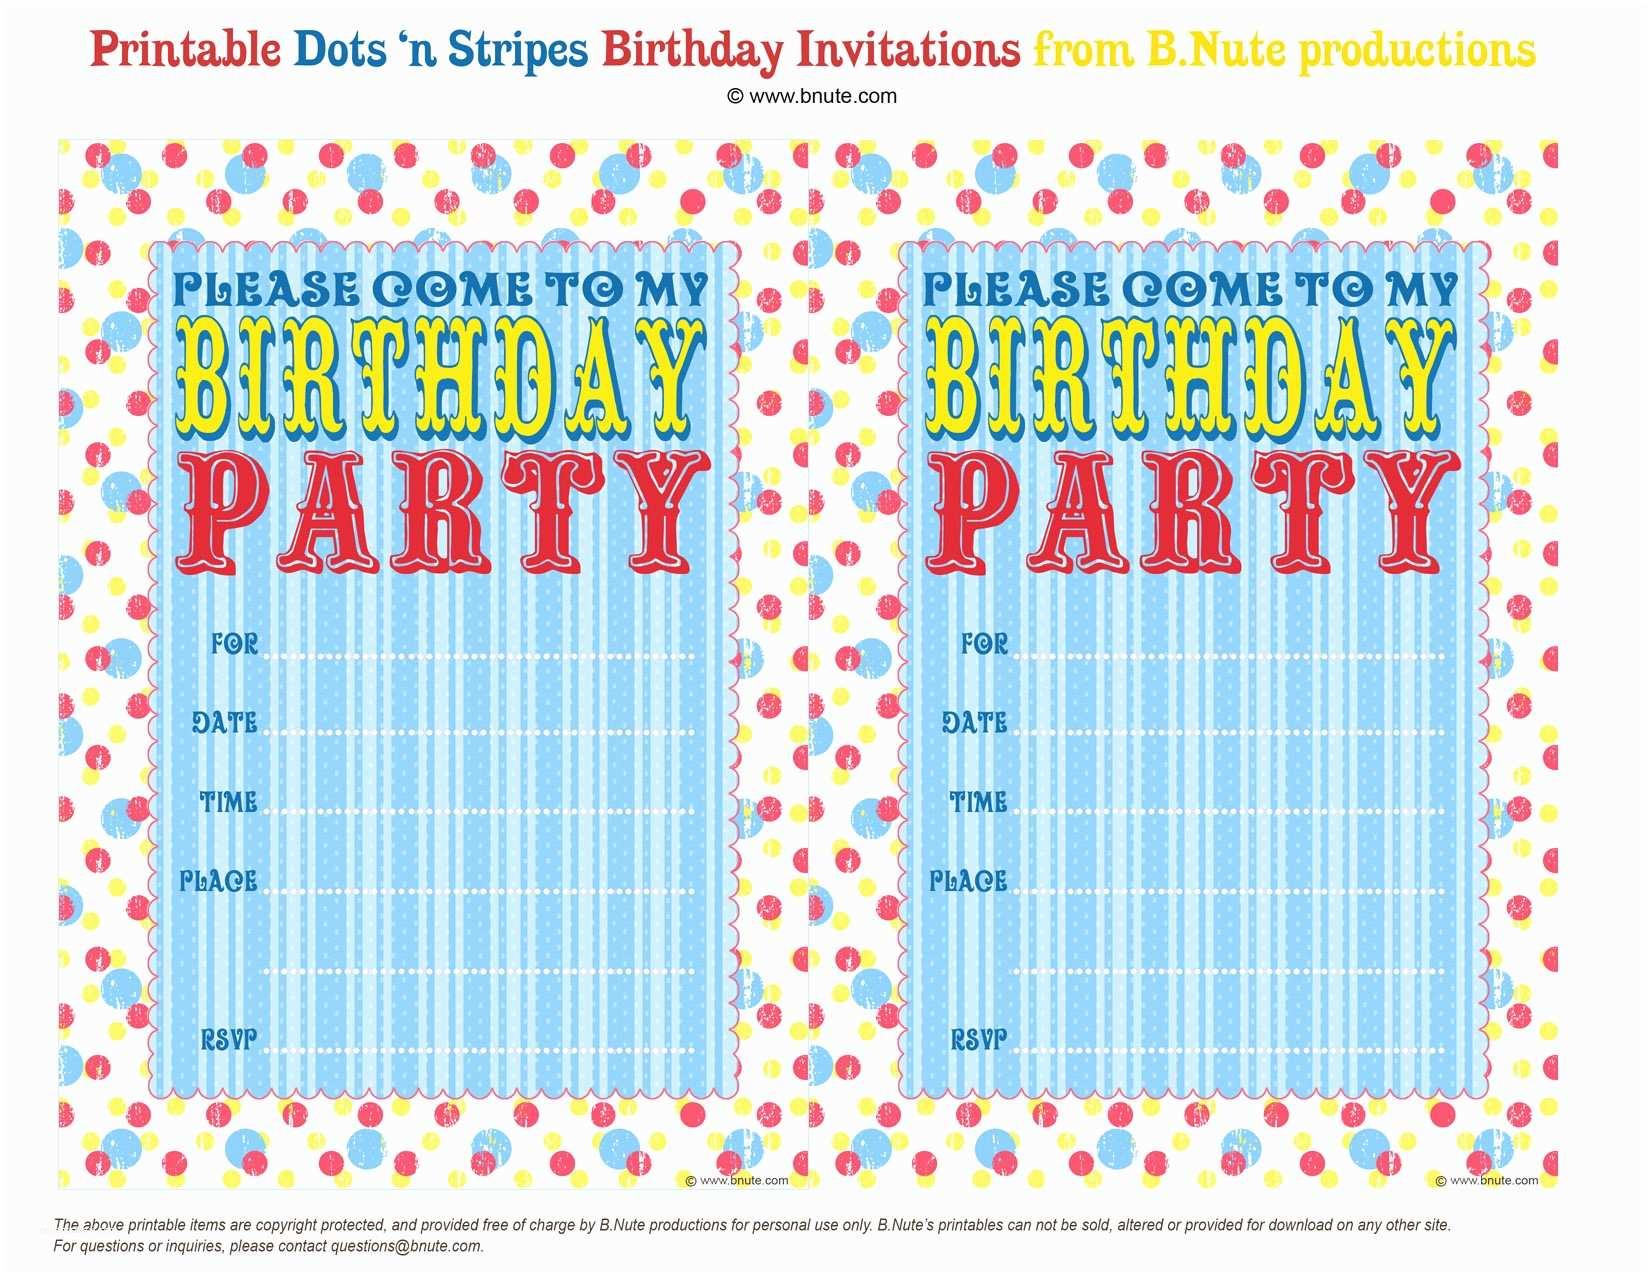 Birthday Party Invitations Online Free Printable Birthday Party Invitations